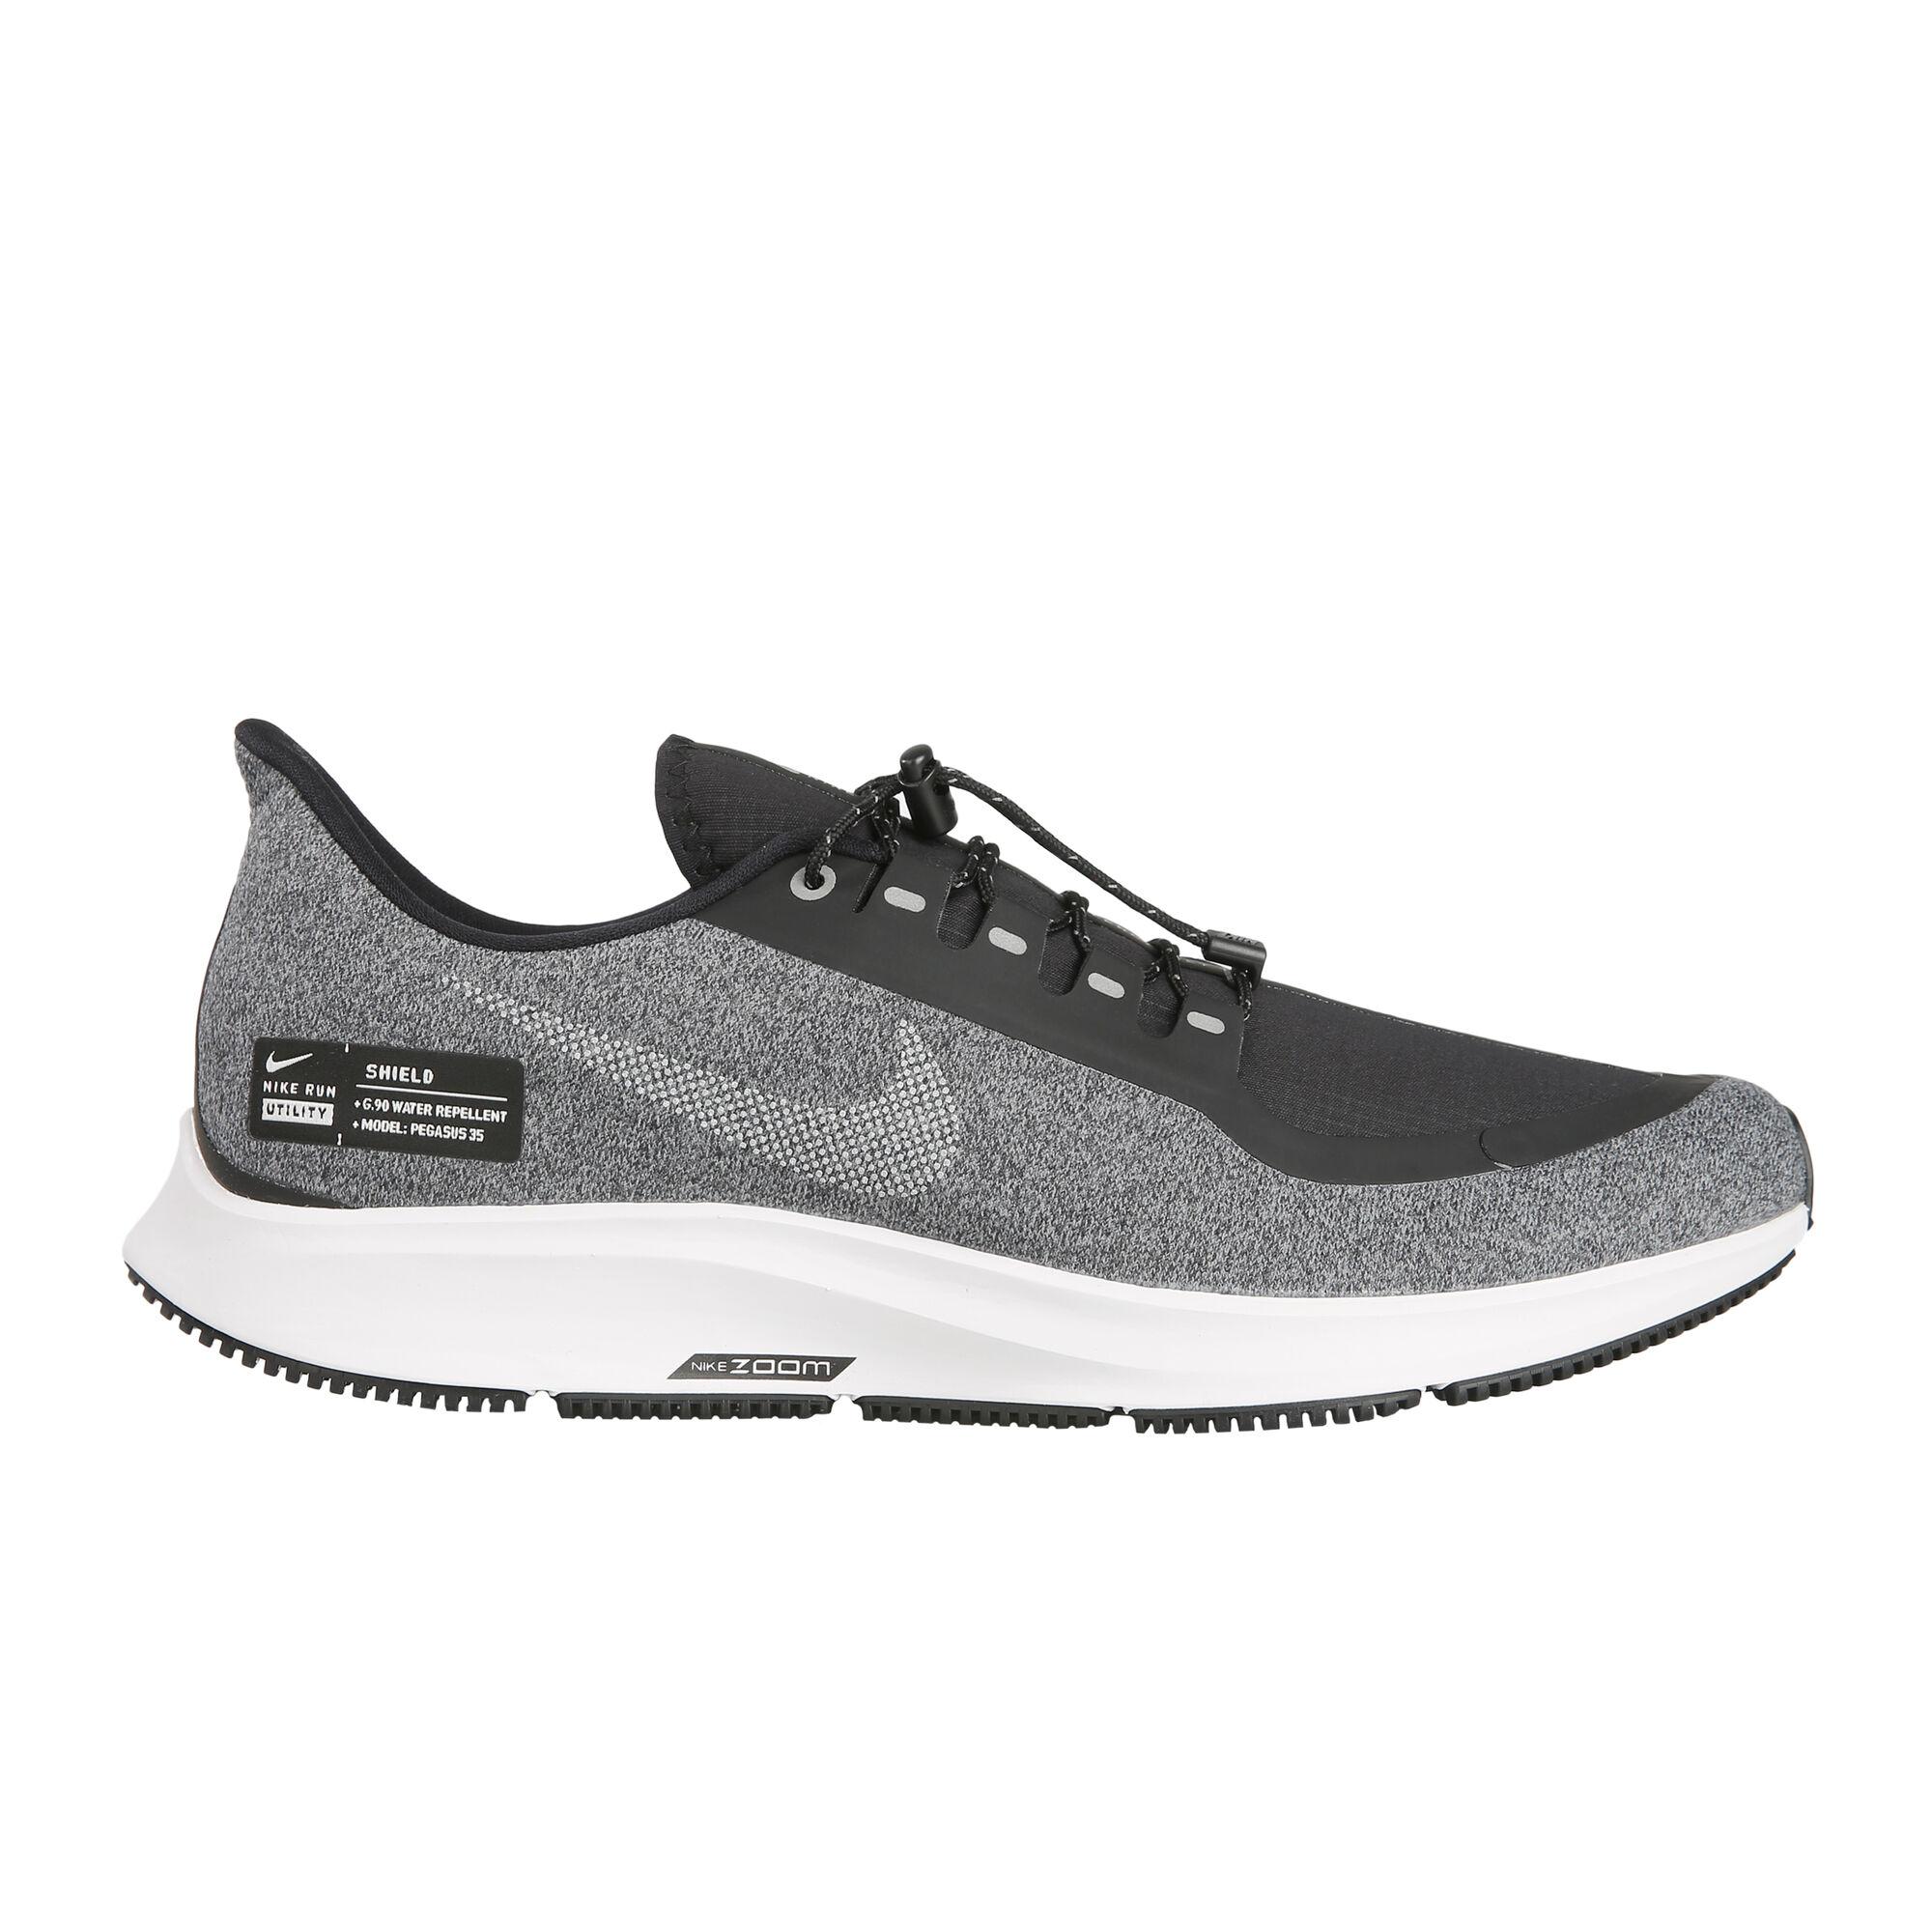 d6c82d1616598 Nike · Nike · Nike · Nike · Nike · Nike · Nike · Nike · Nike. Air Zoom  Pegasus 35 Shield ...